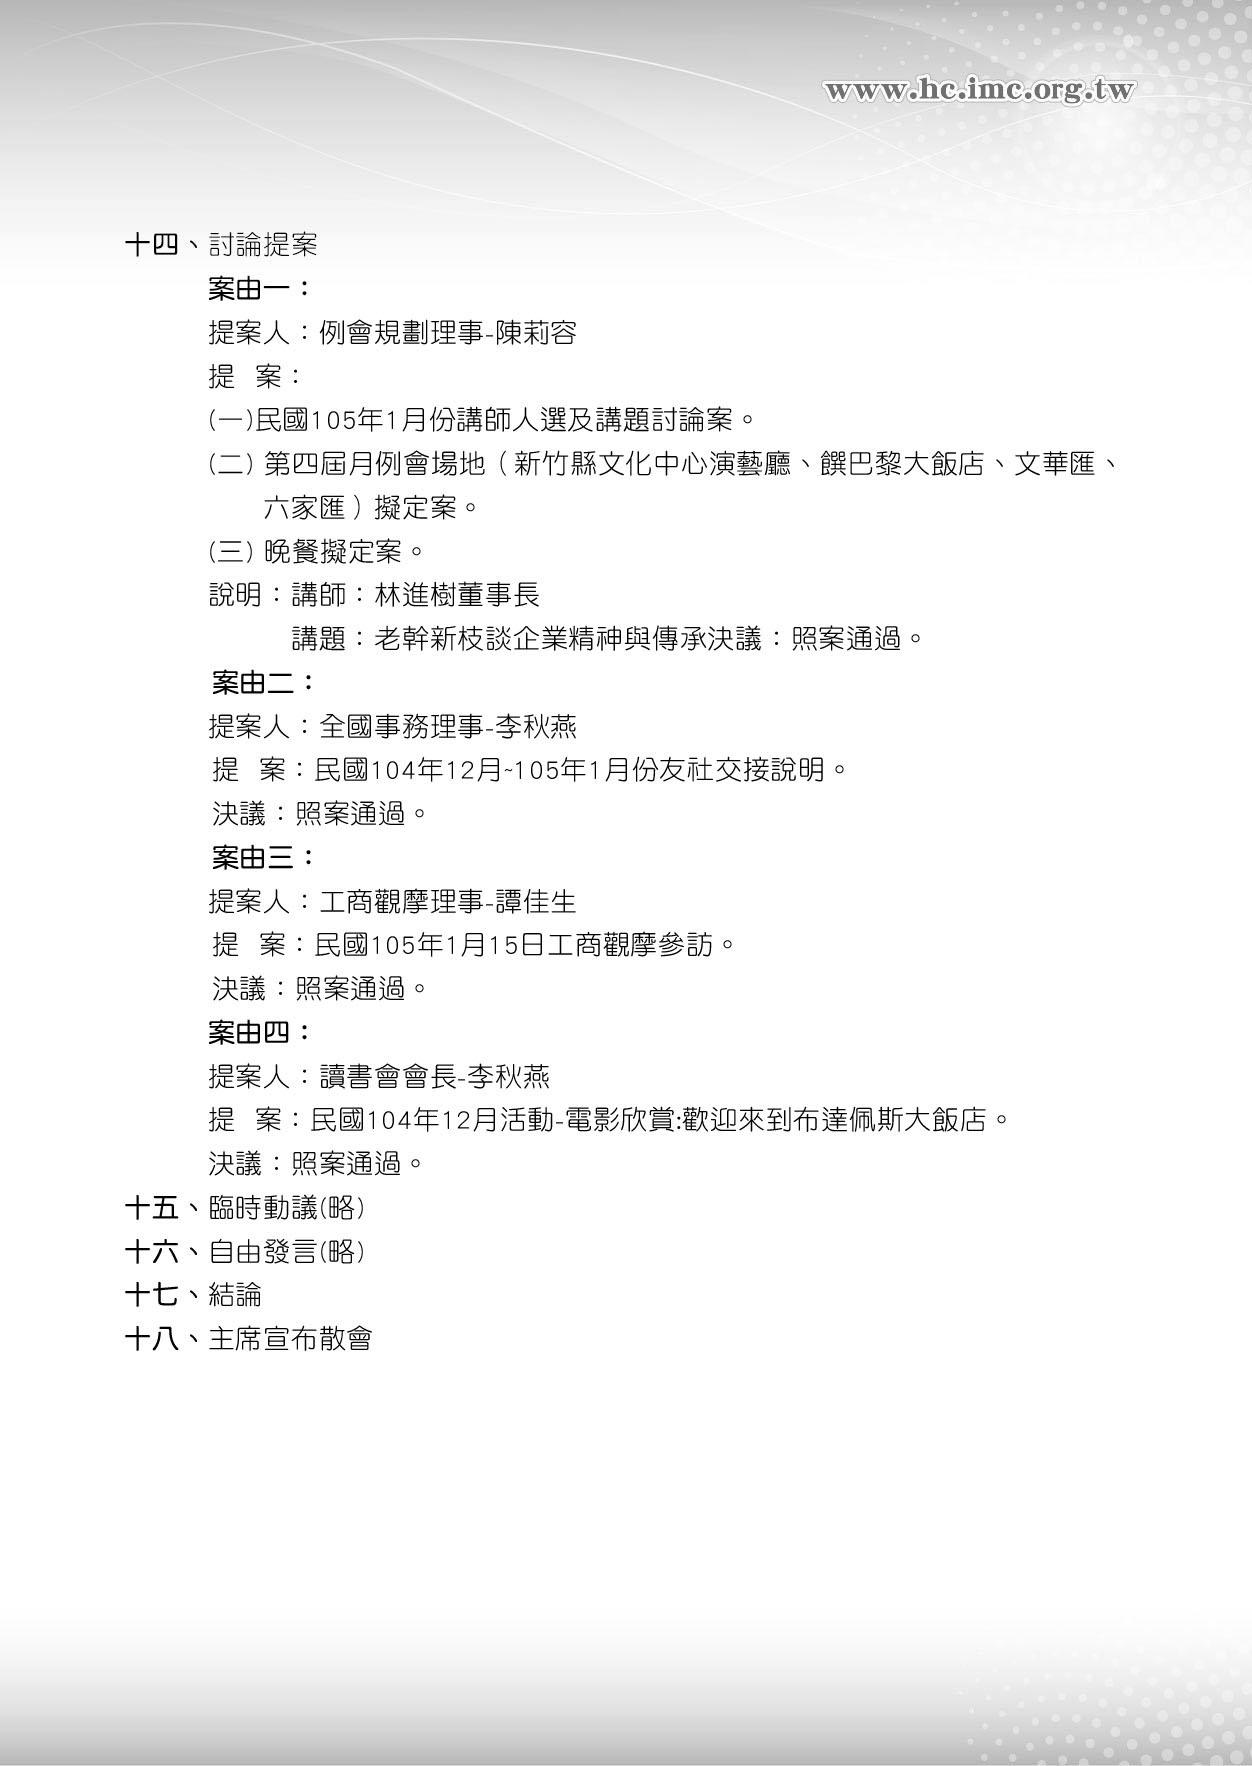 C2-超越鼎峰2-內頁-膠裝-100P-A4銅版紙黑白雙面印-P